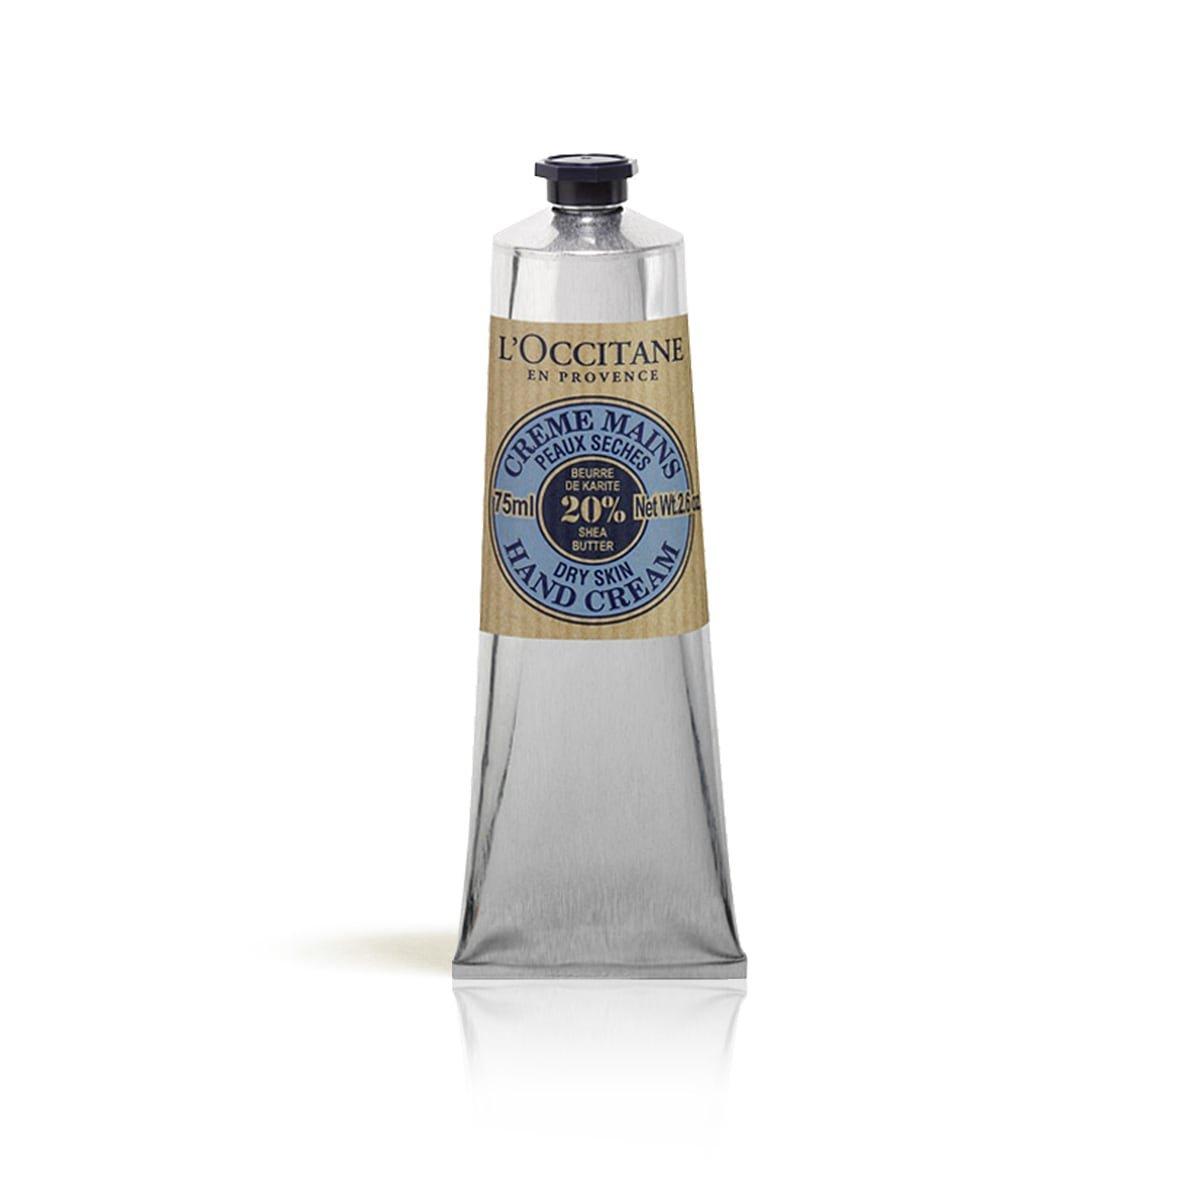 L'OCCITANE - Crema de Manos Karité - 75 ml L'OCCITANE